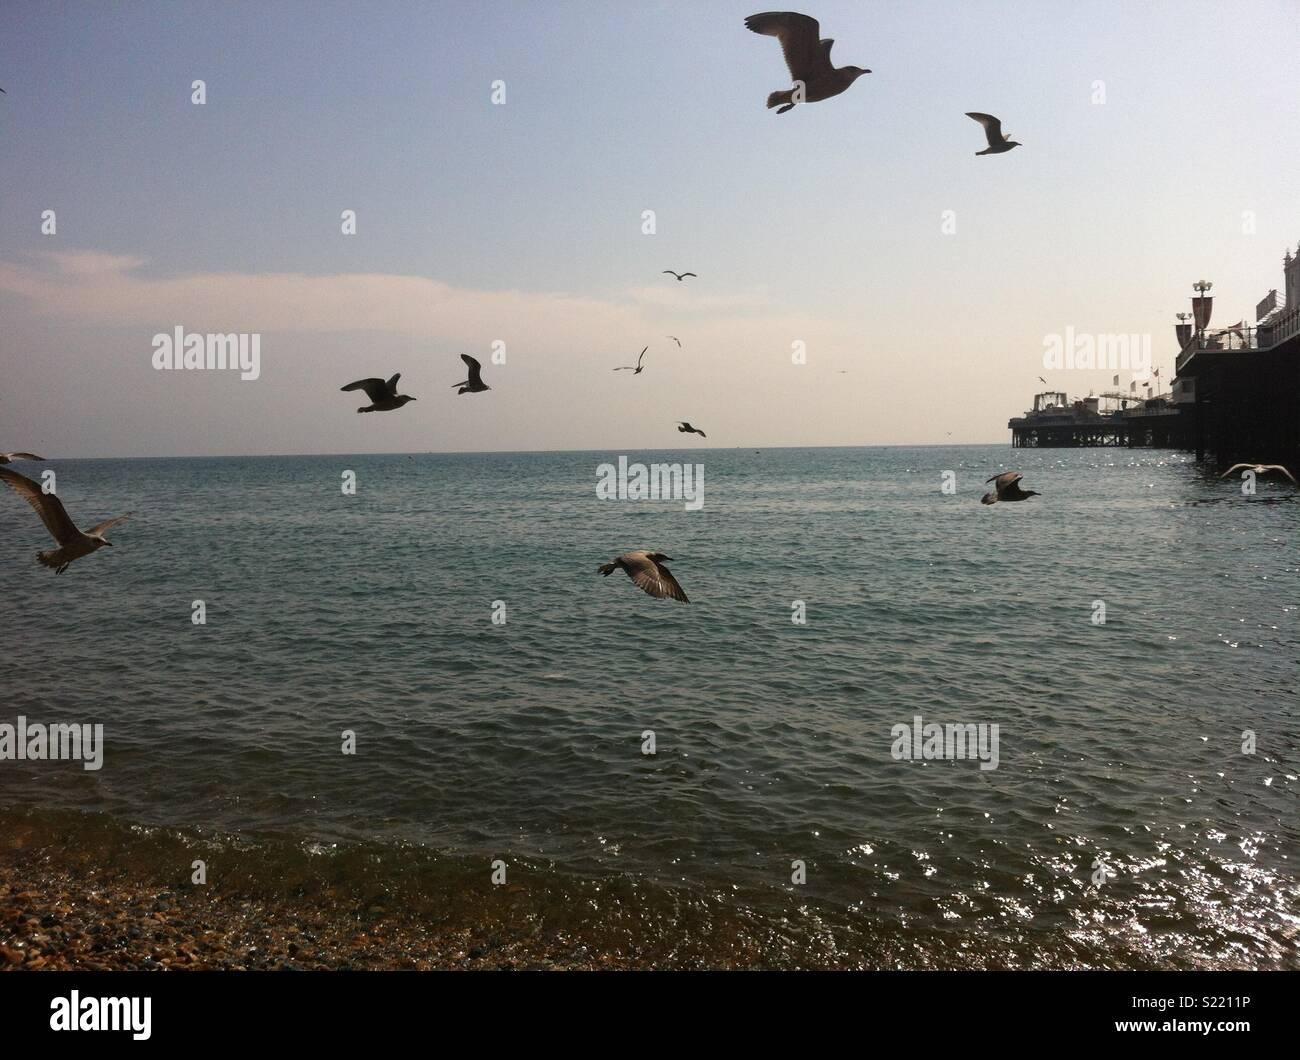 Seagulls fly away - Stock Image